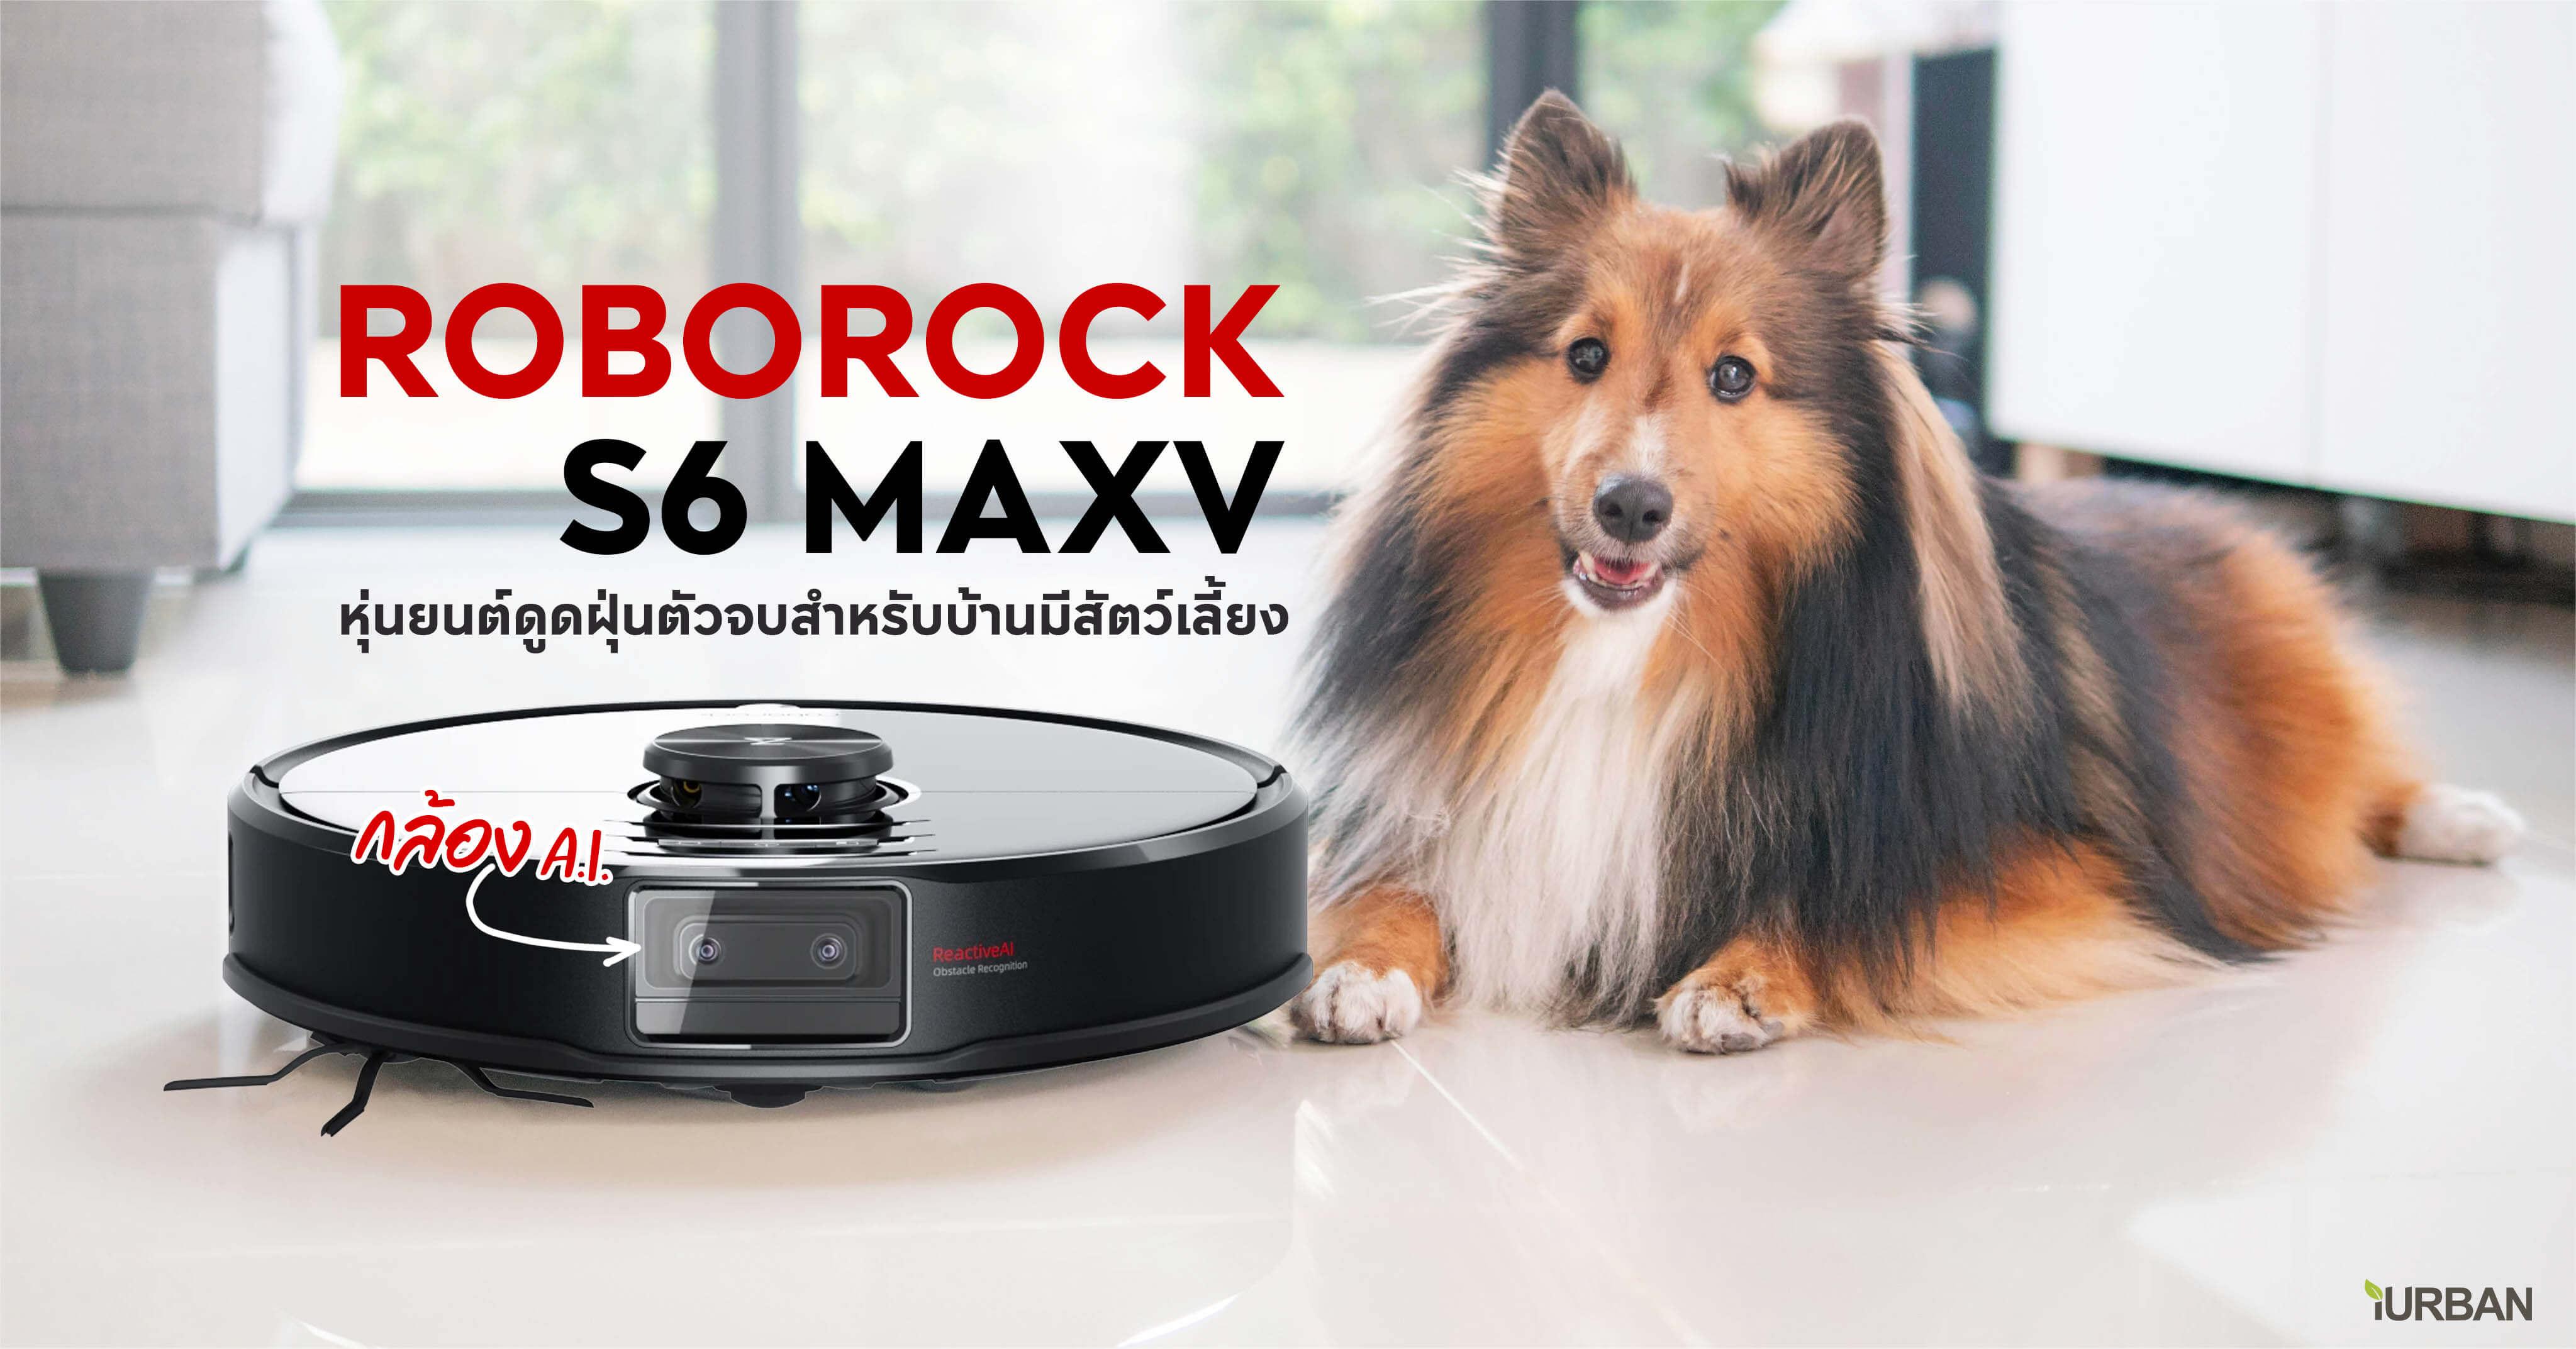 ROBOROCK S6 MAXV รีวิวหุ่นยนต์ดูดฝุ่นตัวท็อปพร้อมกล้อง A.I. ฉลาดขนาดหลบอึหมาได้ 13 - Automatic